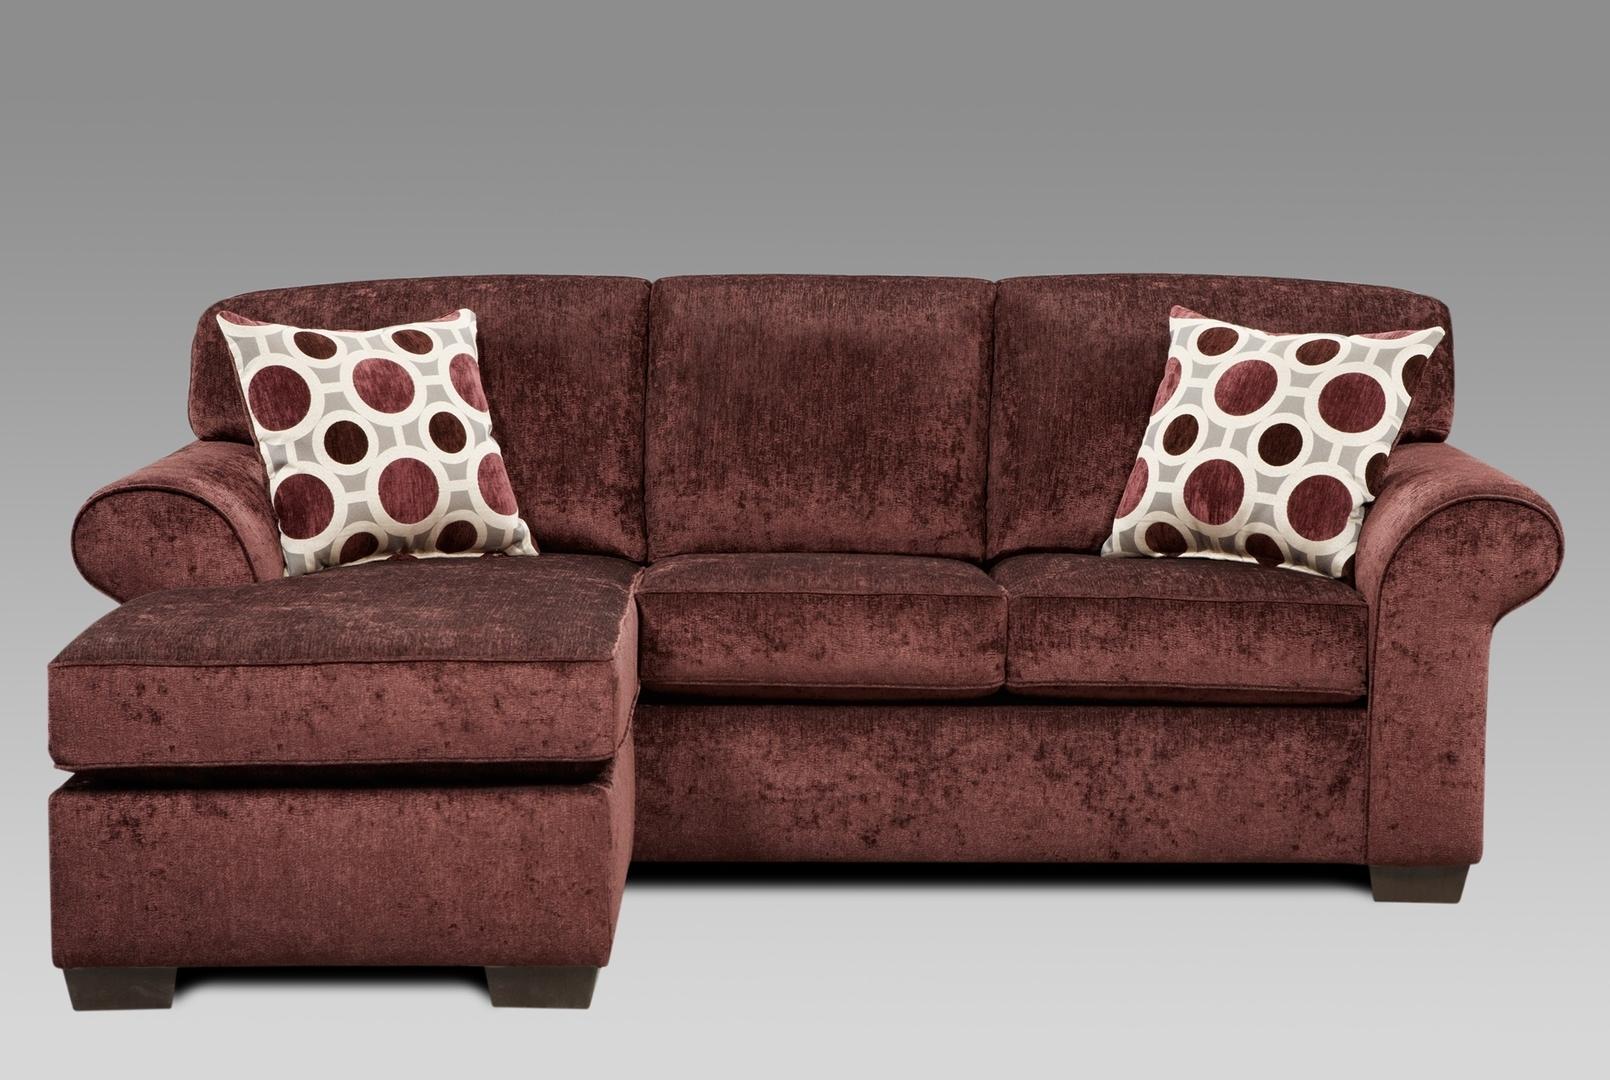 Well Liked Tuscaloosa Sectional Sofas Regarding Sofas: Tuscaloosa, Al: Southeastern Furniture (Gallery 9 of 20)